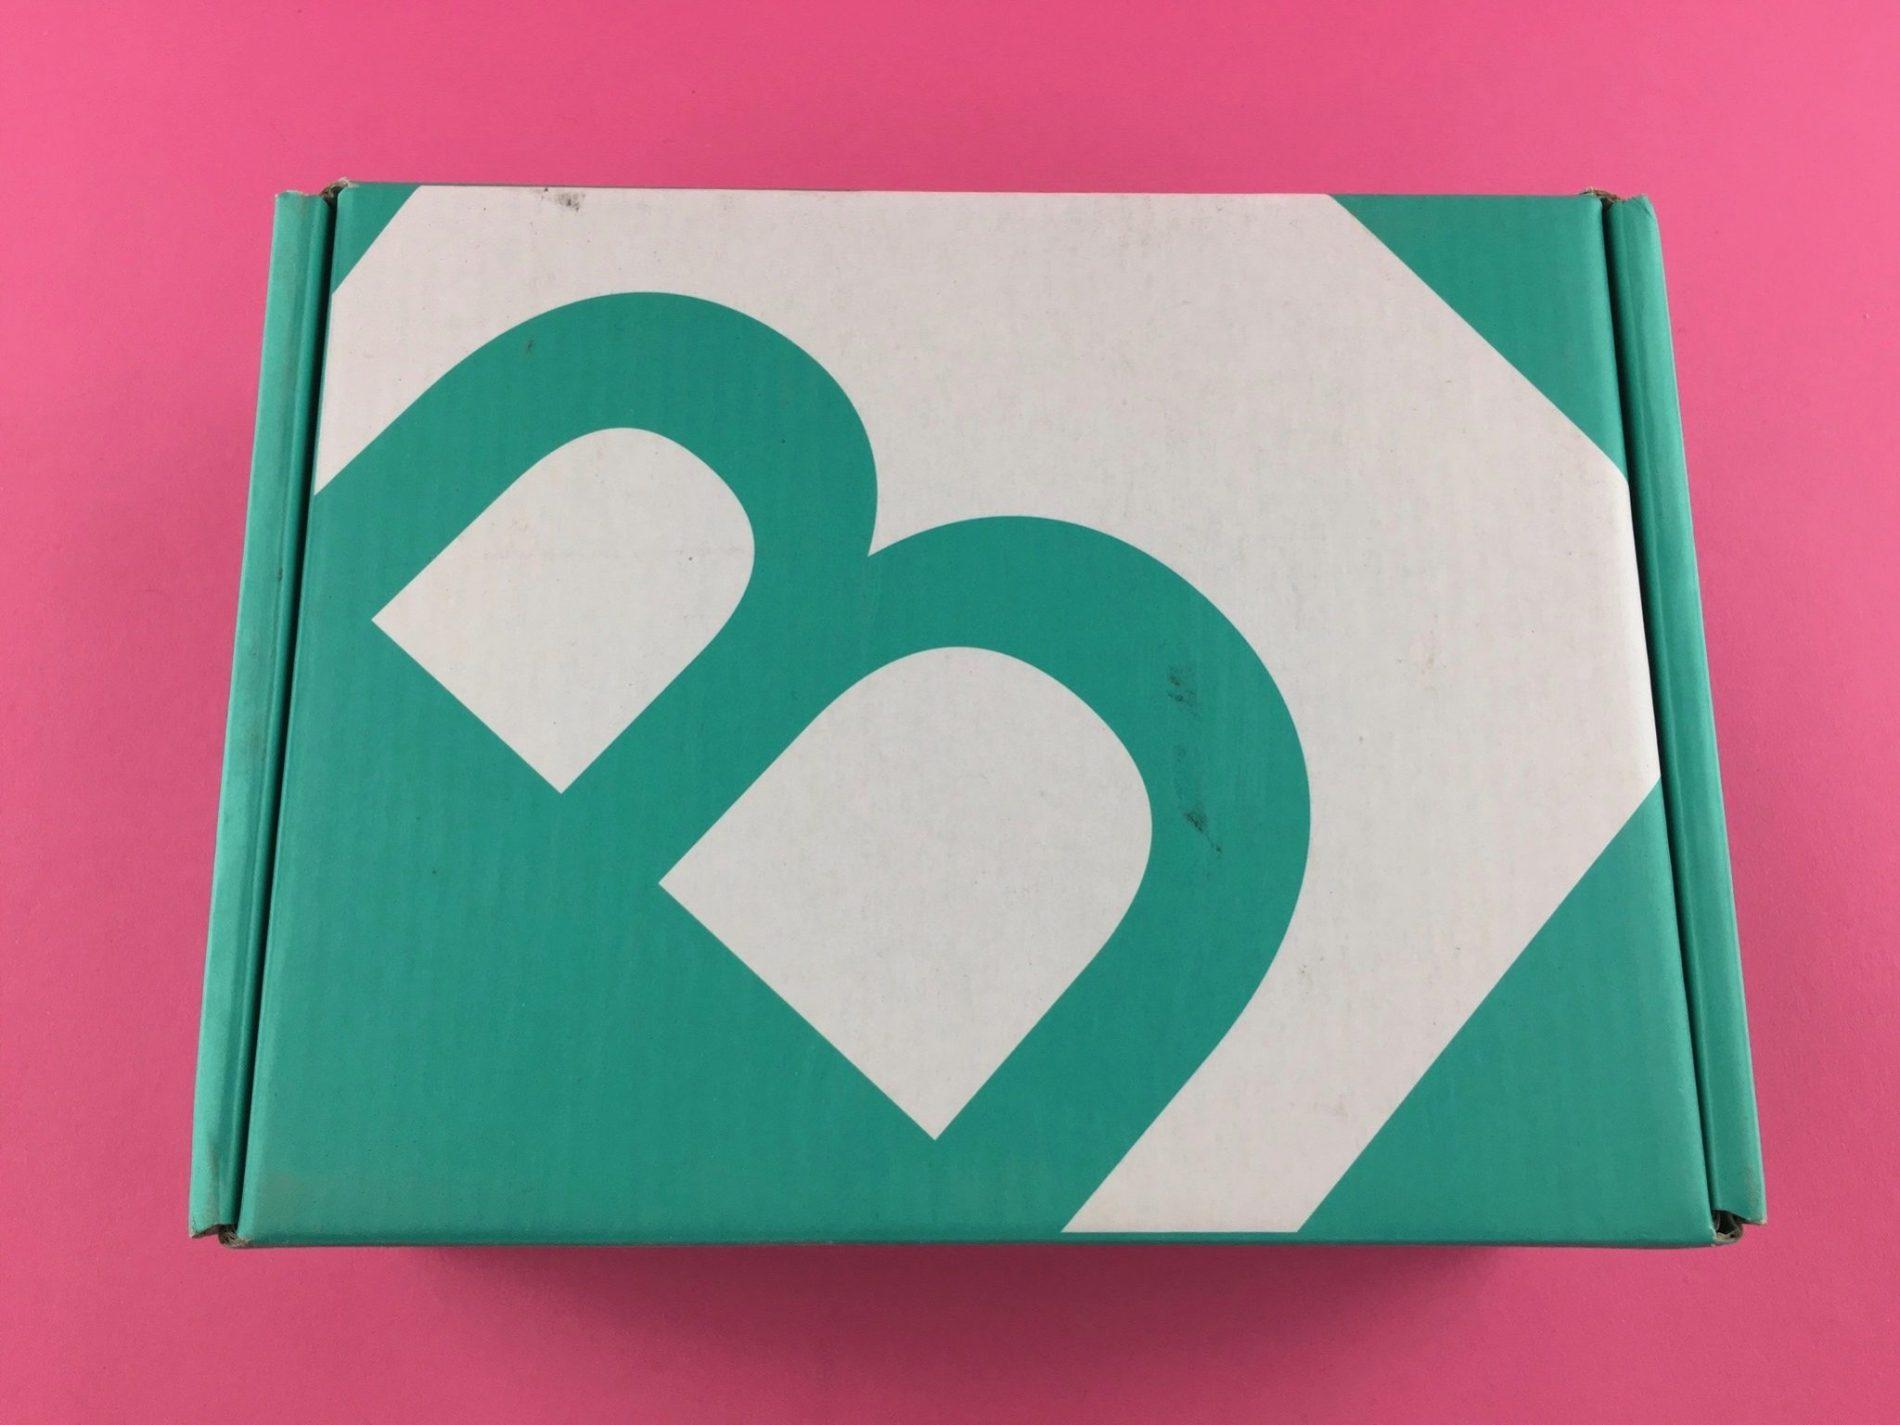 Your Bijoux Box April 2018 Spoiler #3